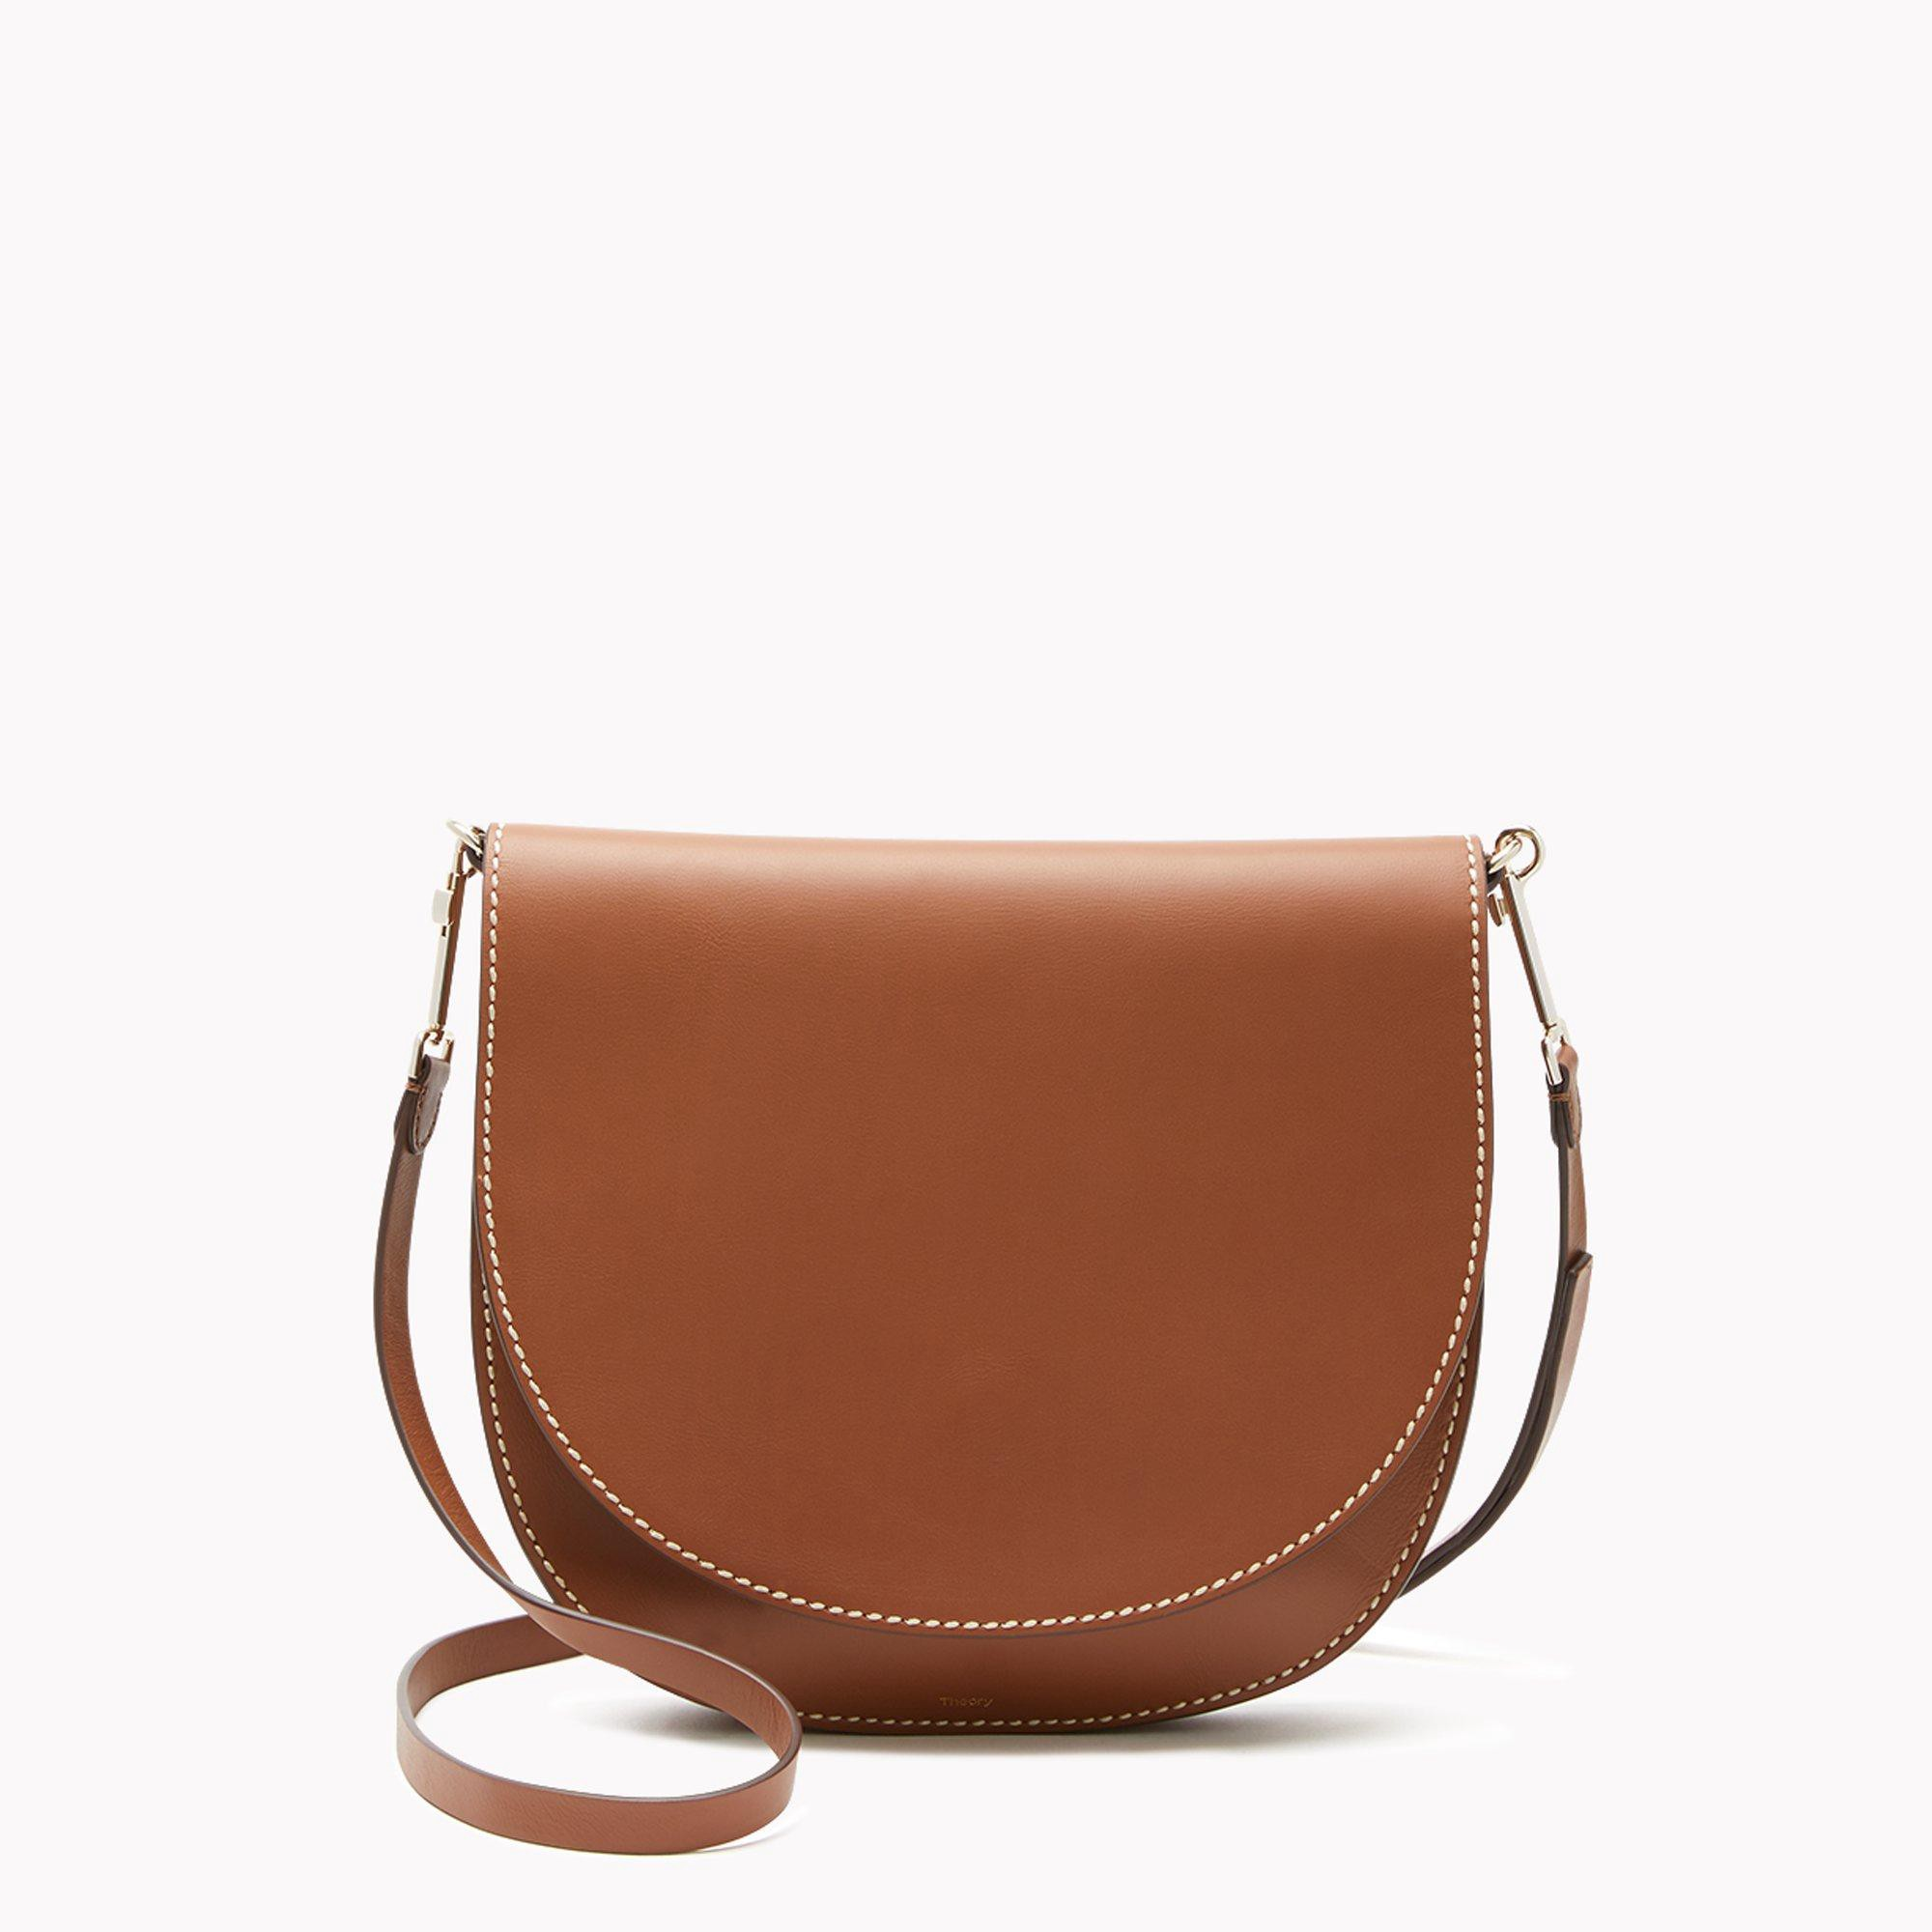 dce4e09472ec Theory Whitney Crossbody Bag In Leather - Cognac | ModeSens